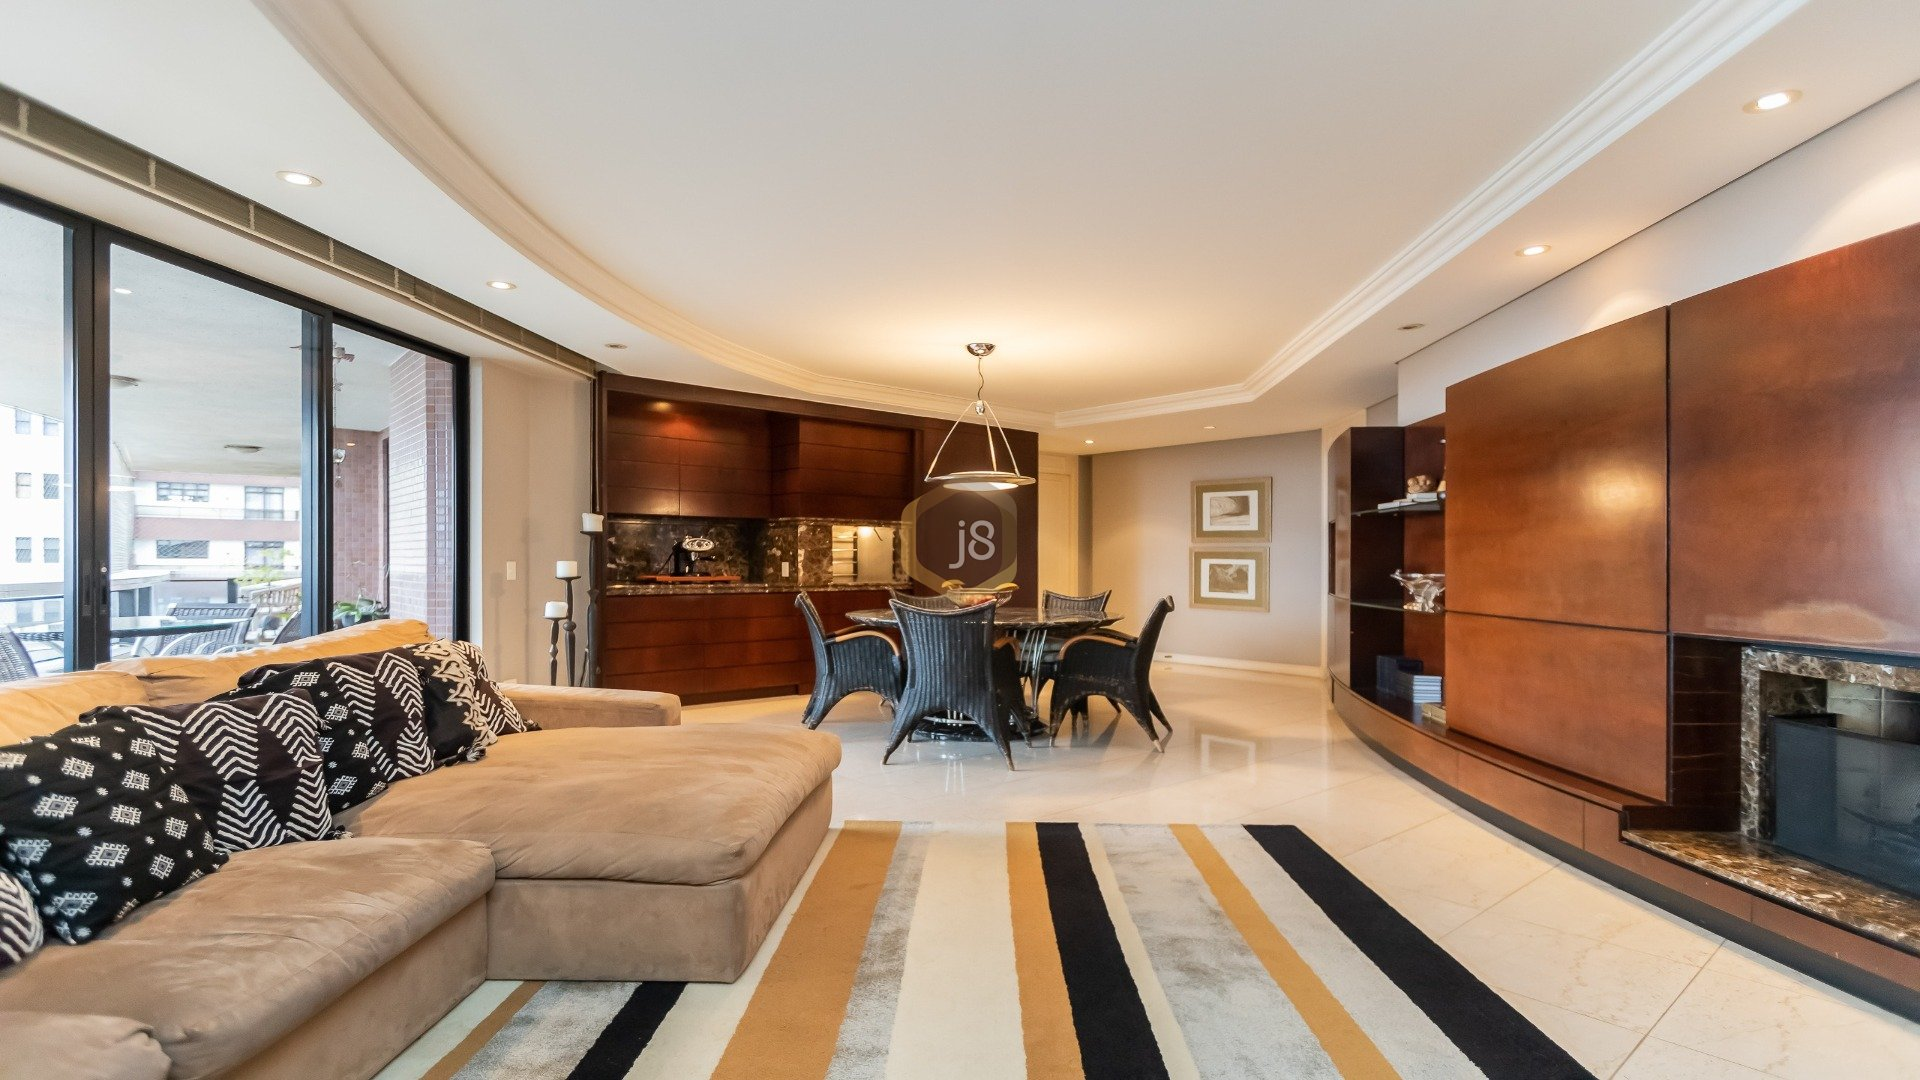 Foto de destaque Sofisticado apartamento no ecoville